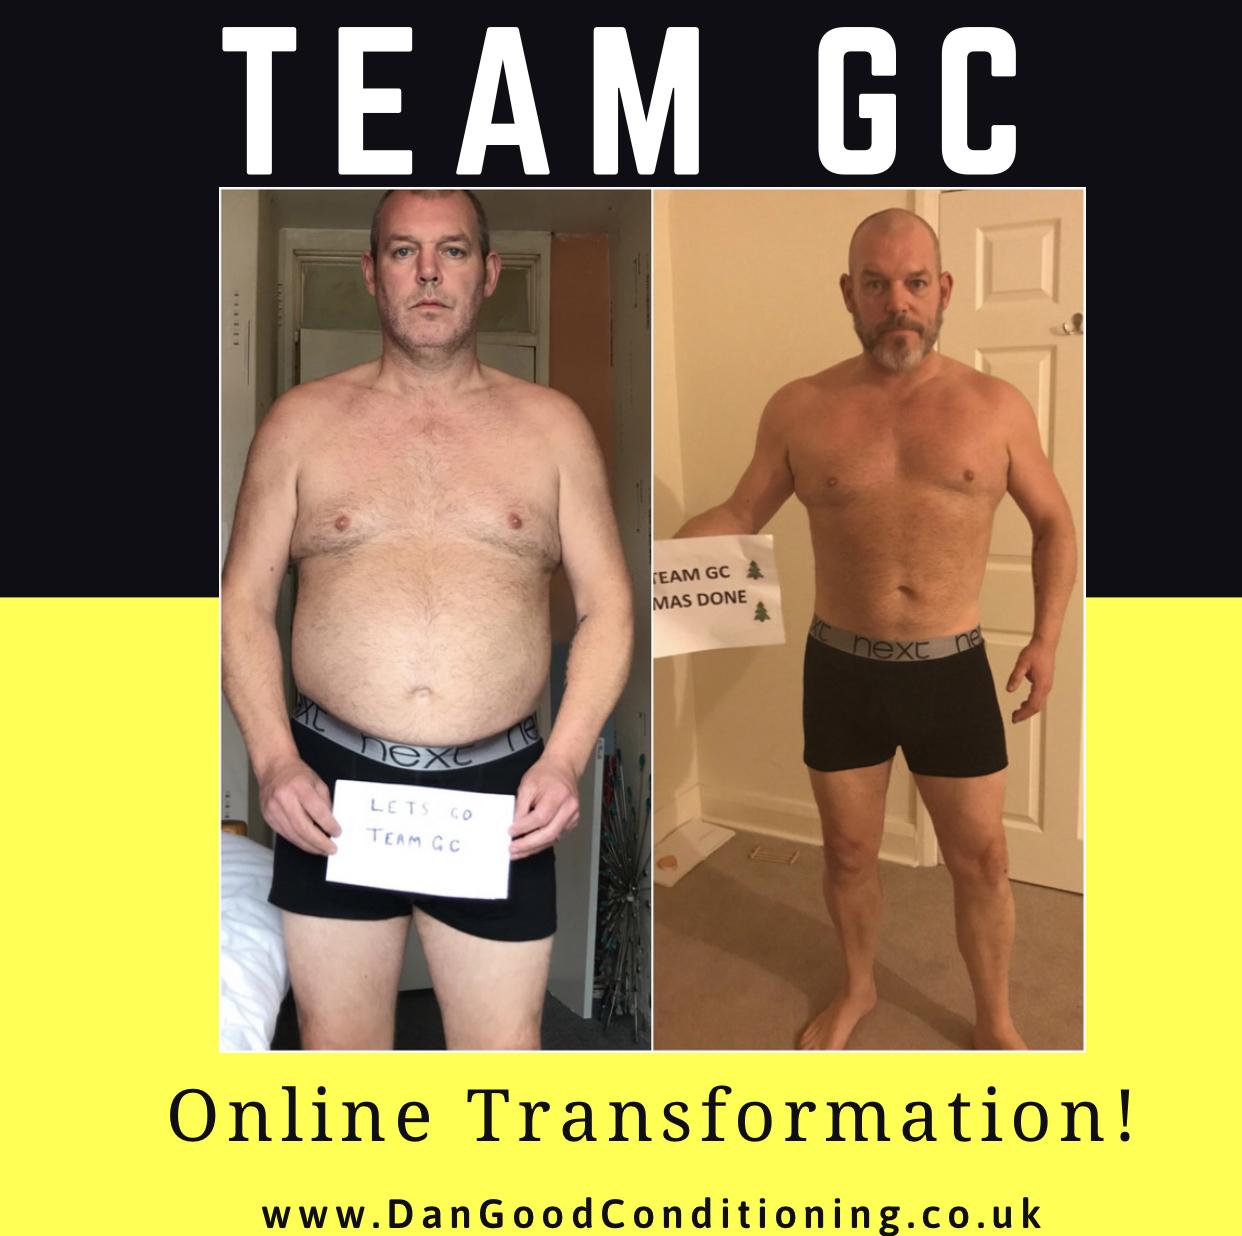 John Mackenzie- Team GC Member